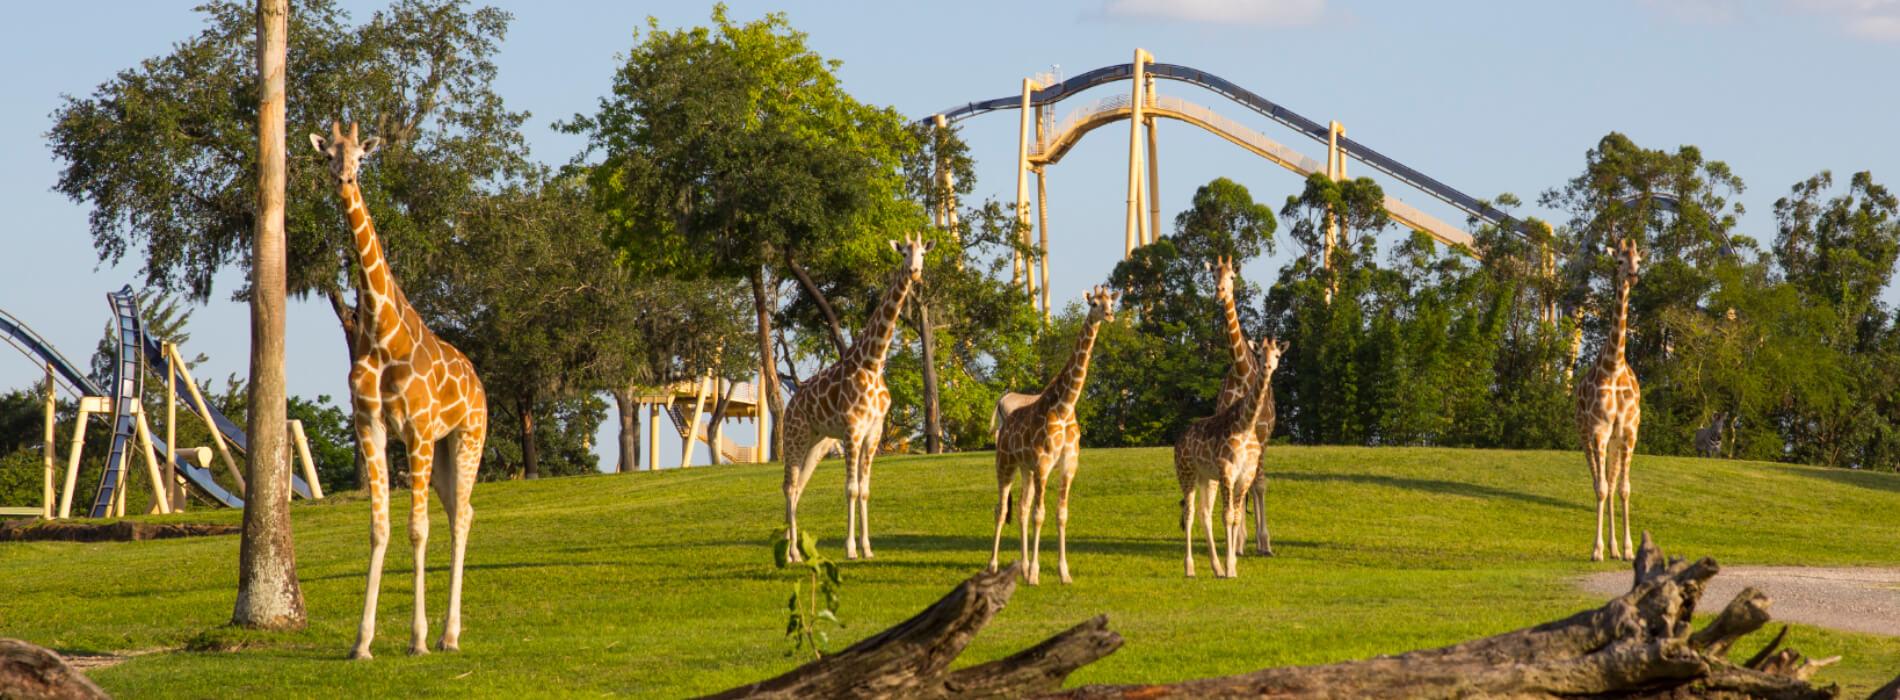 See the Giraffe at Busch Gardens Tampa Bay